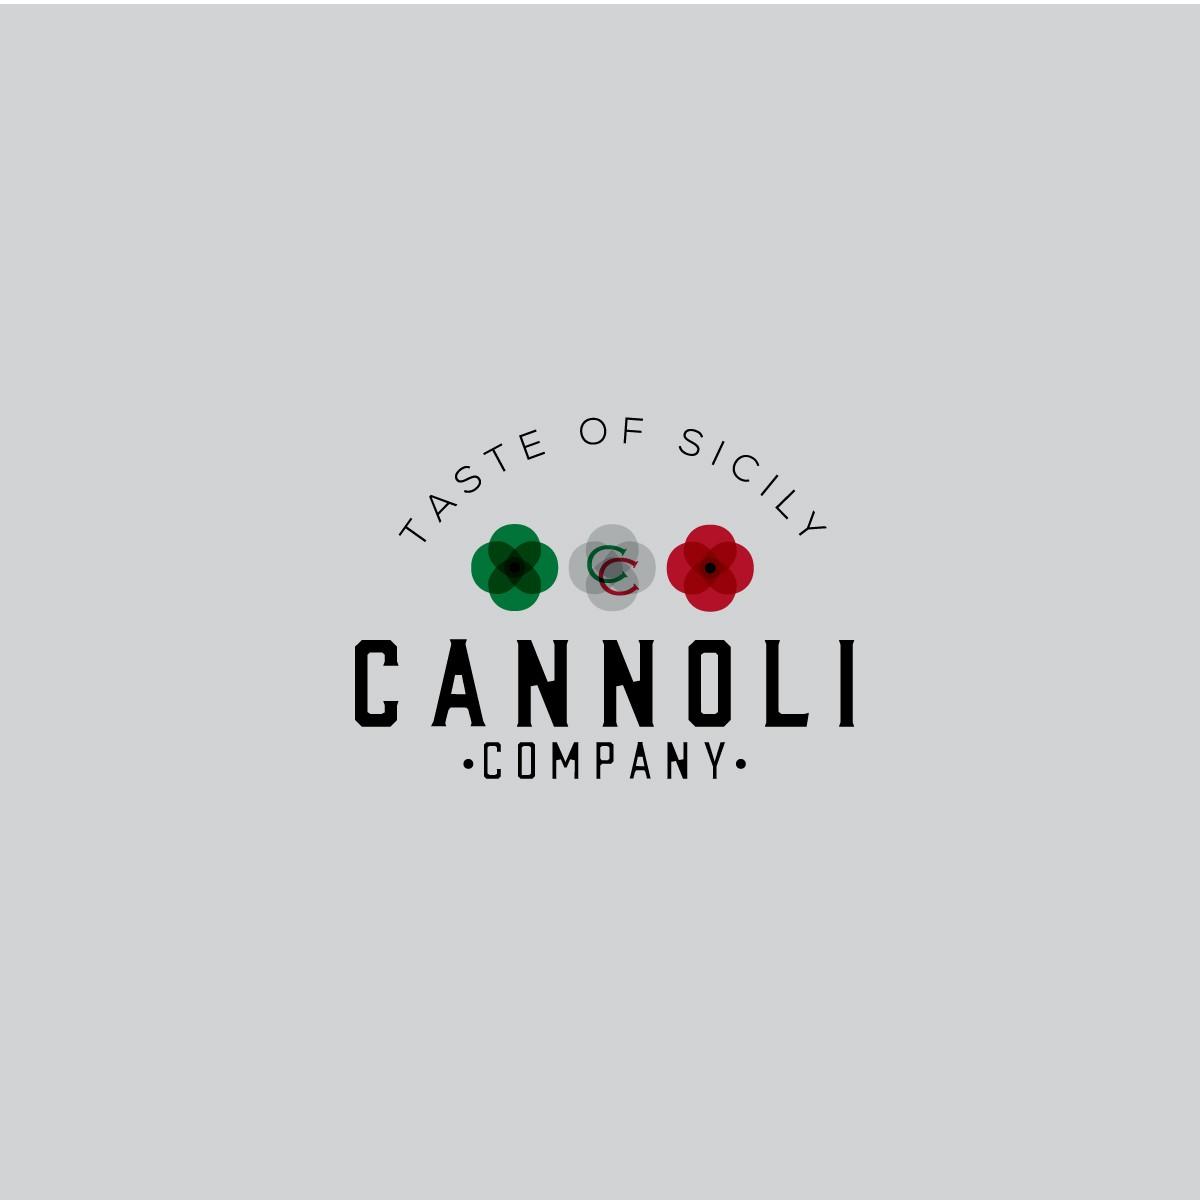 Cannoli-Company